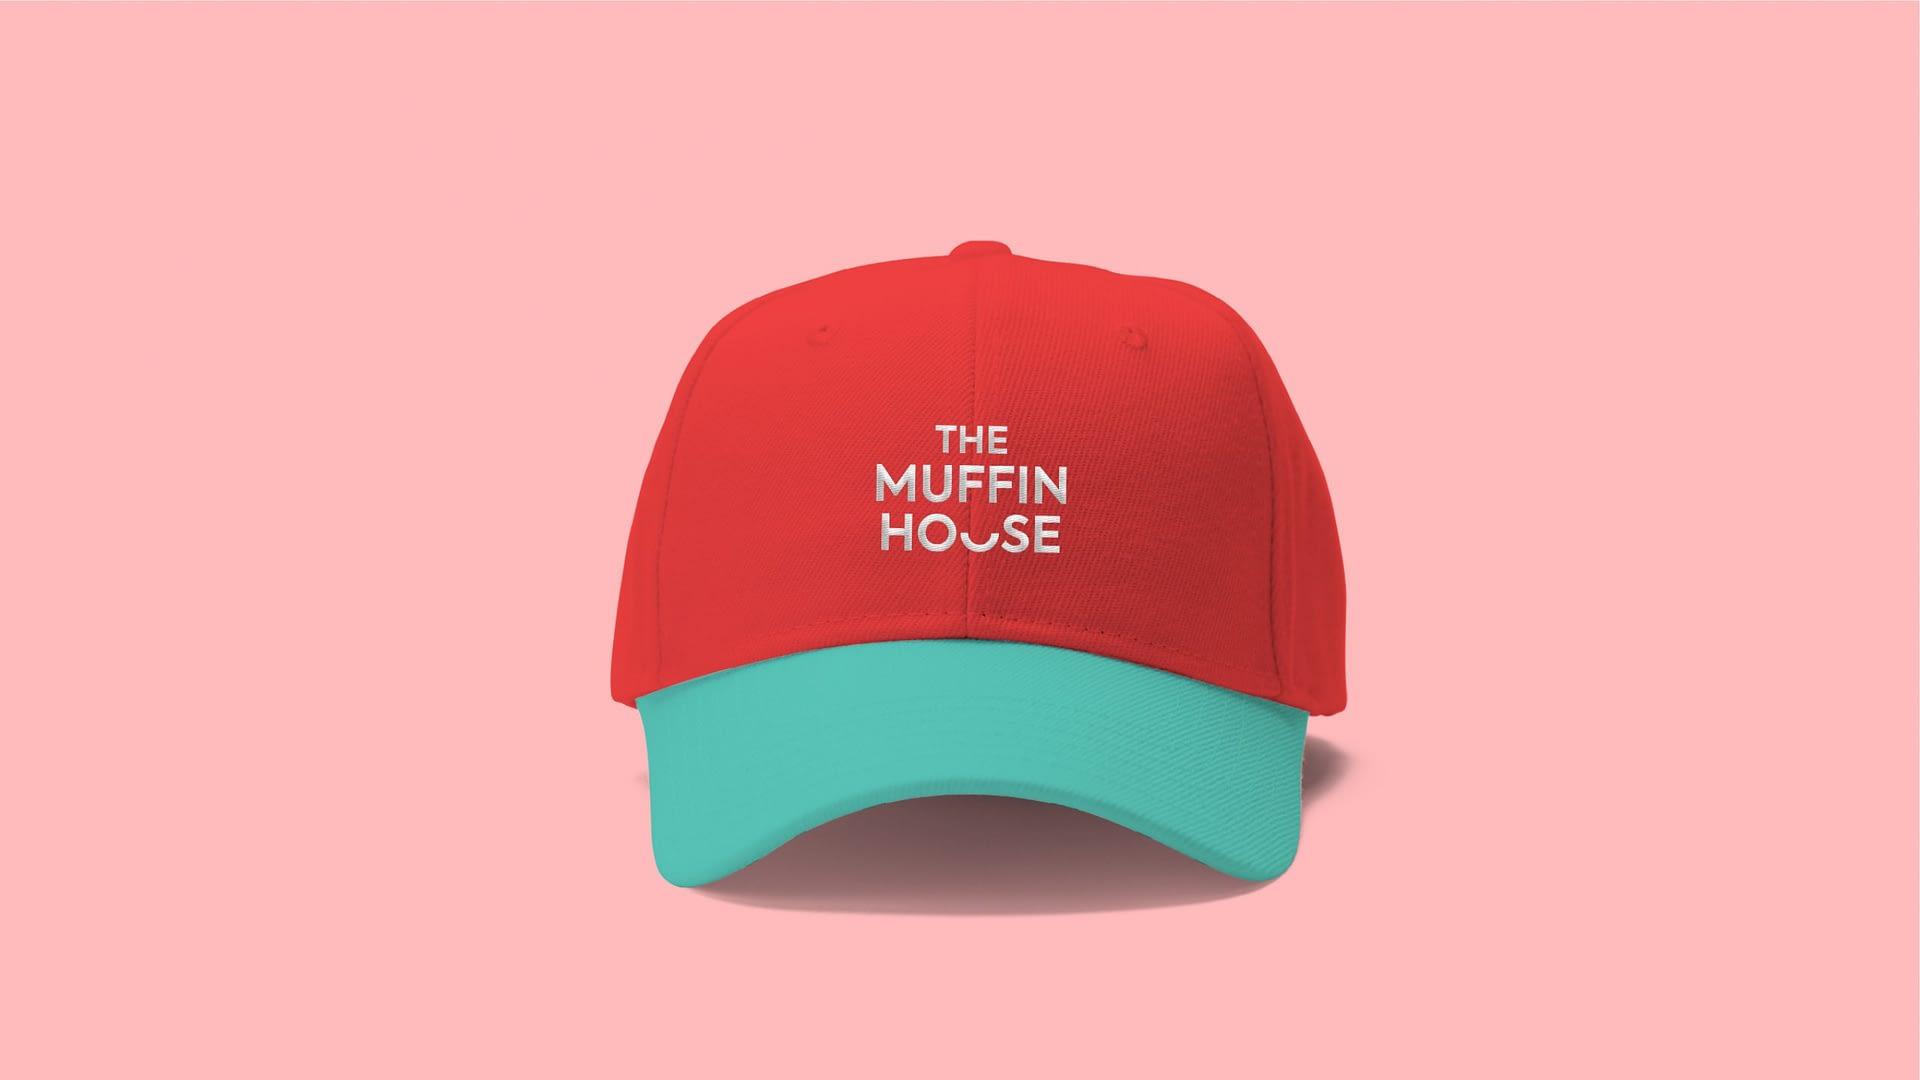 THE MUFFIN HOUSE CAP DESIGN